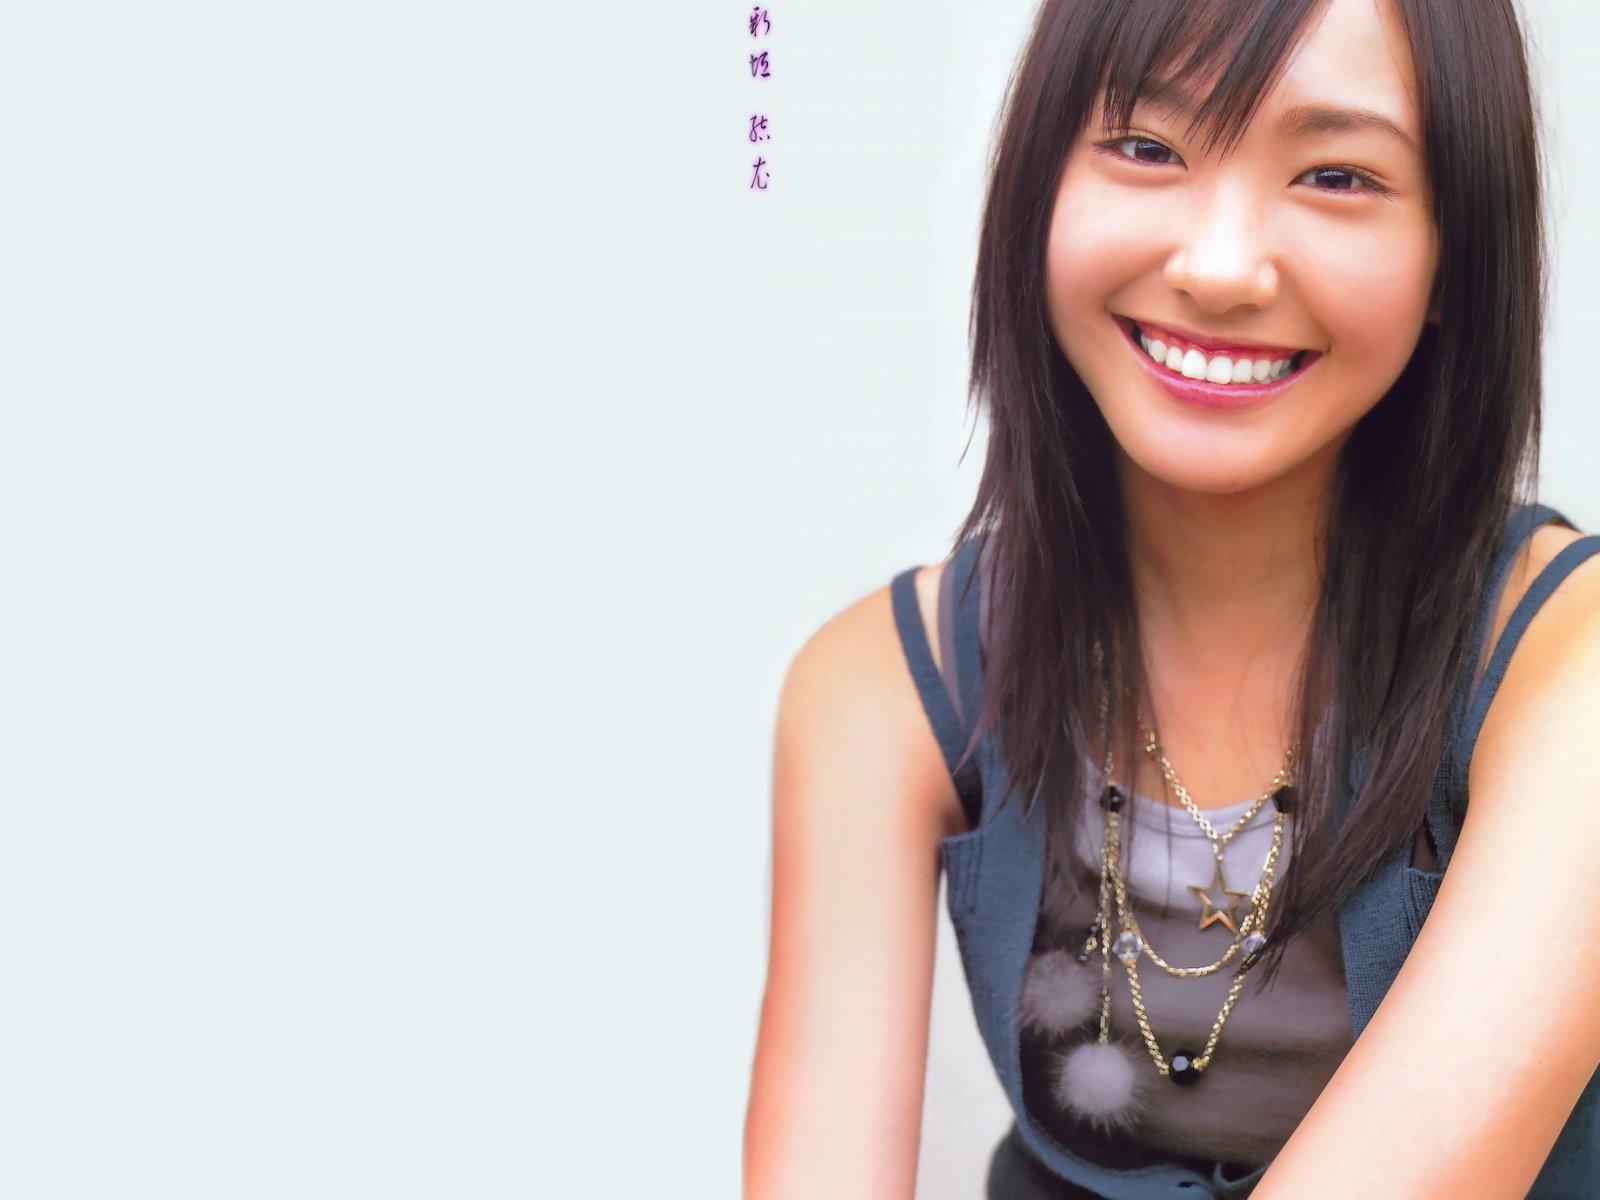 Aragaki Yui Wallpaper | www.imgkid.com - The Image Kid Has It!